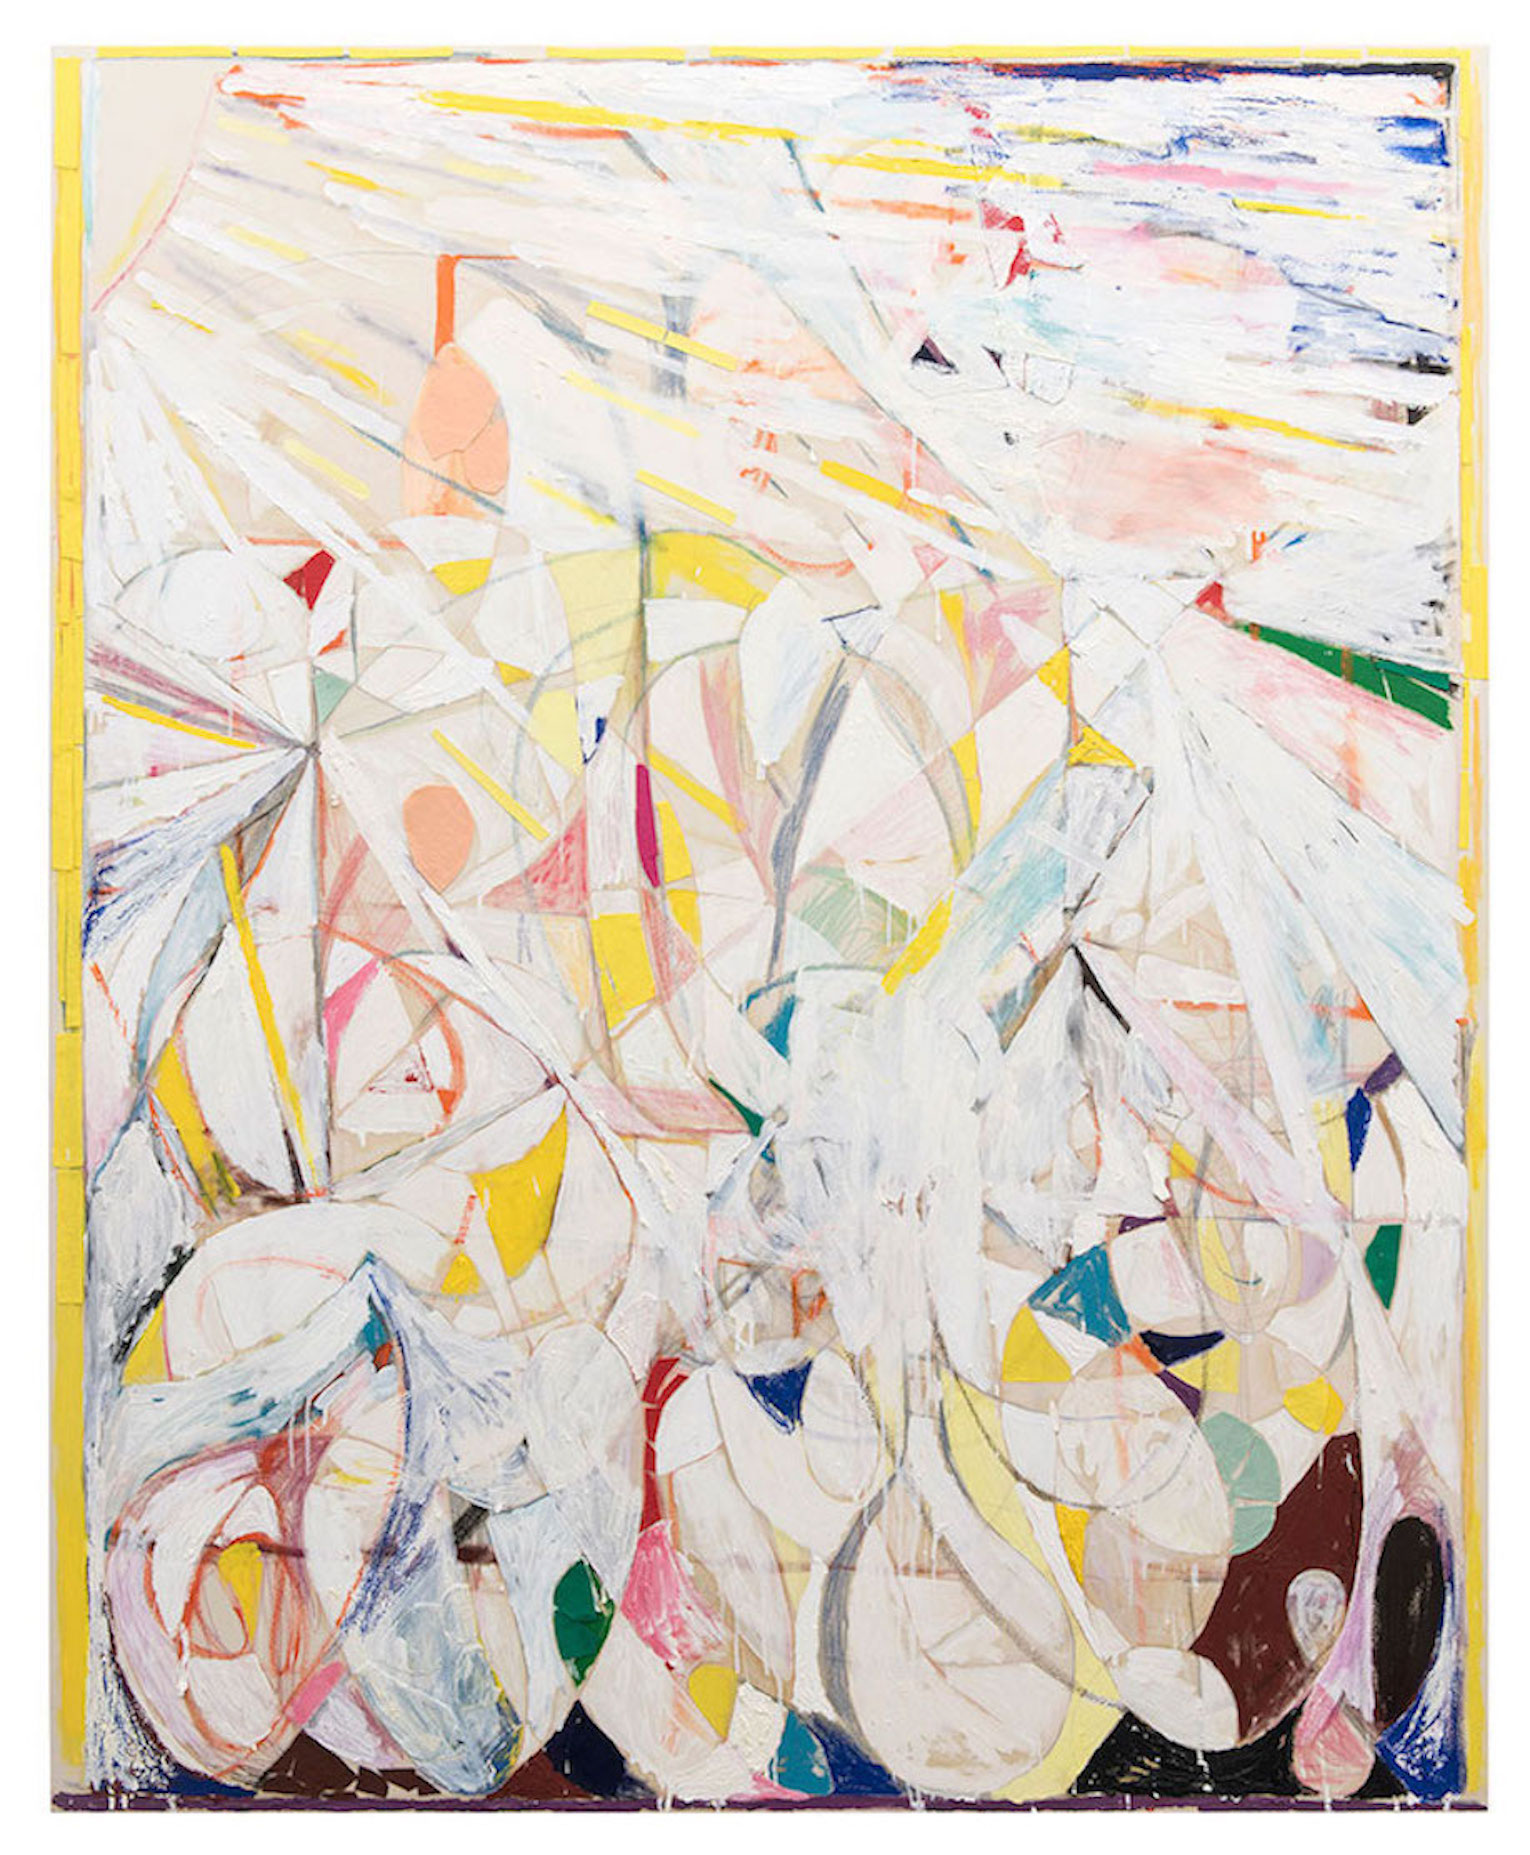 <b>Title:</b>Slowly Fading Forms<br /><b>Year:</b>2016<br /><b>Medium:</b>mixed media on canvas<br /><b>Size:</b>210cm  x 170cm